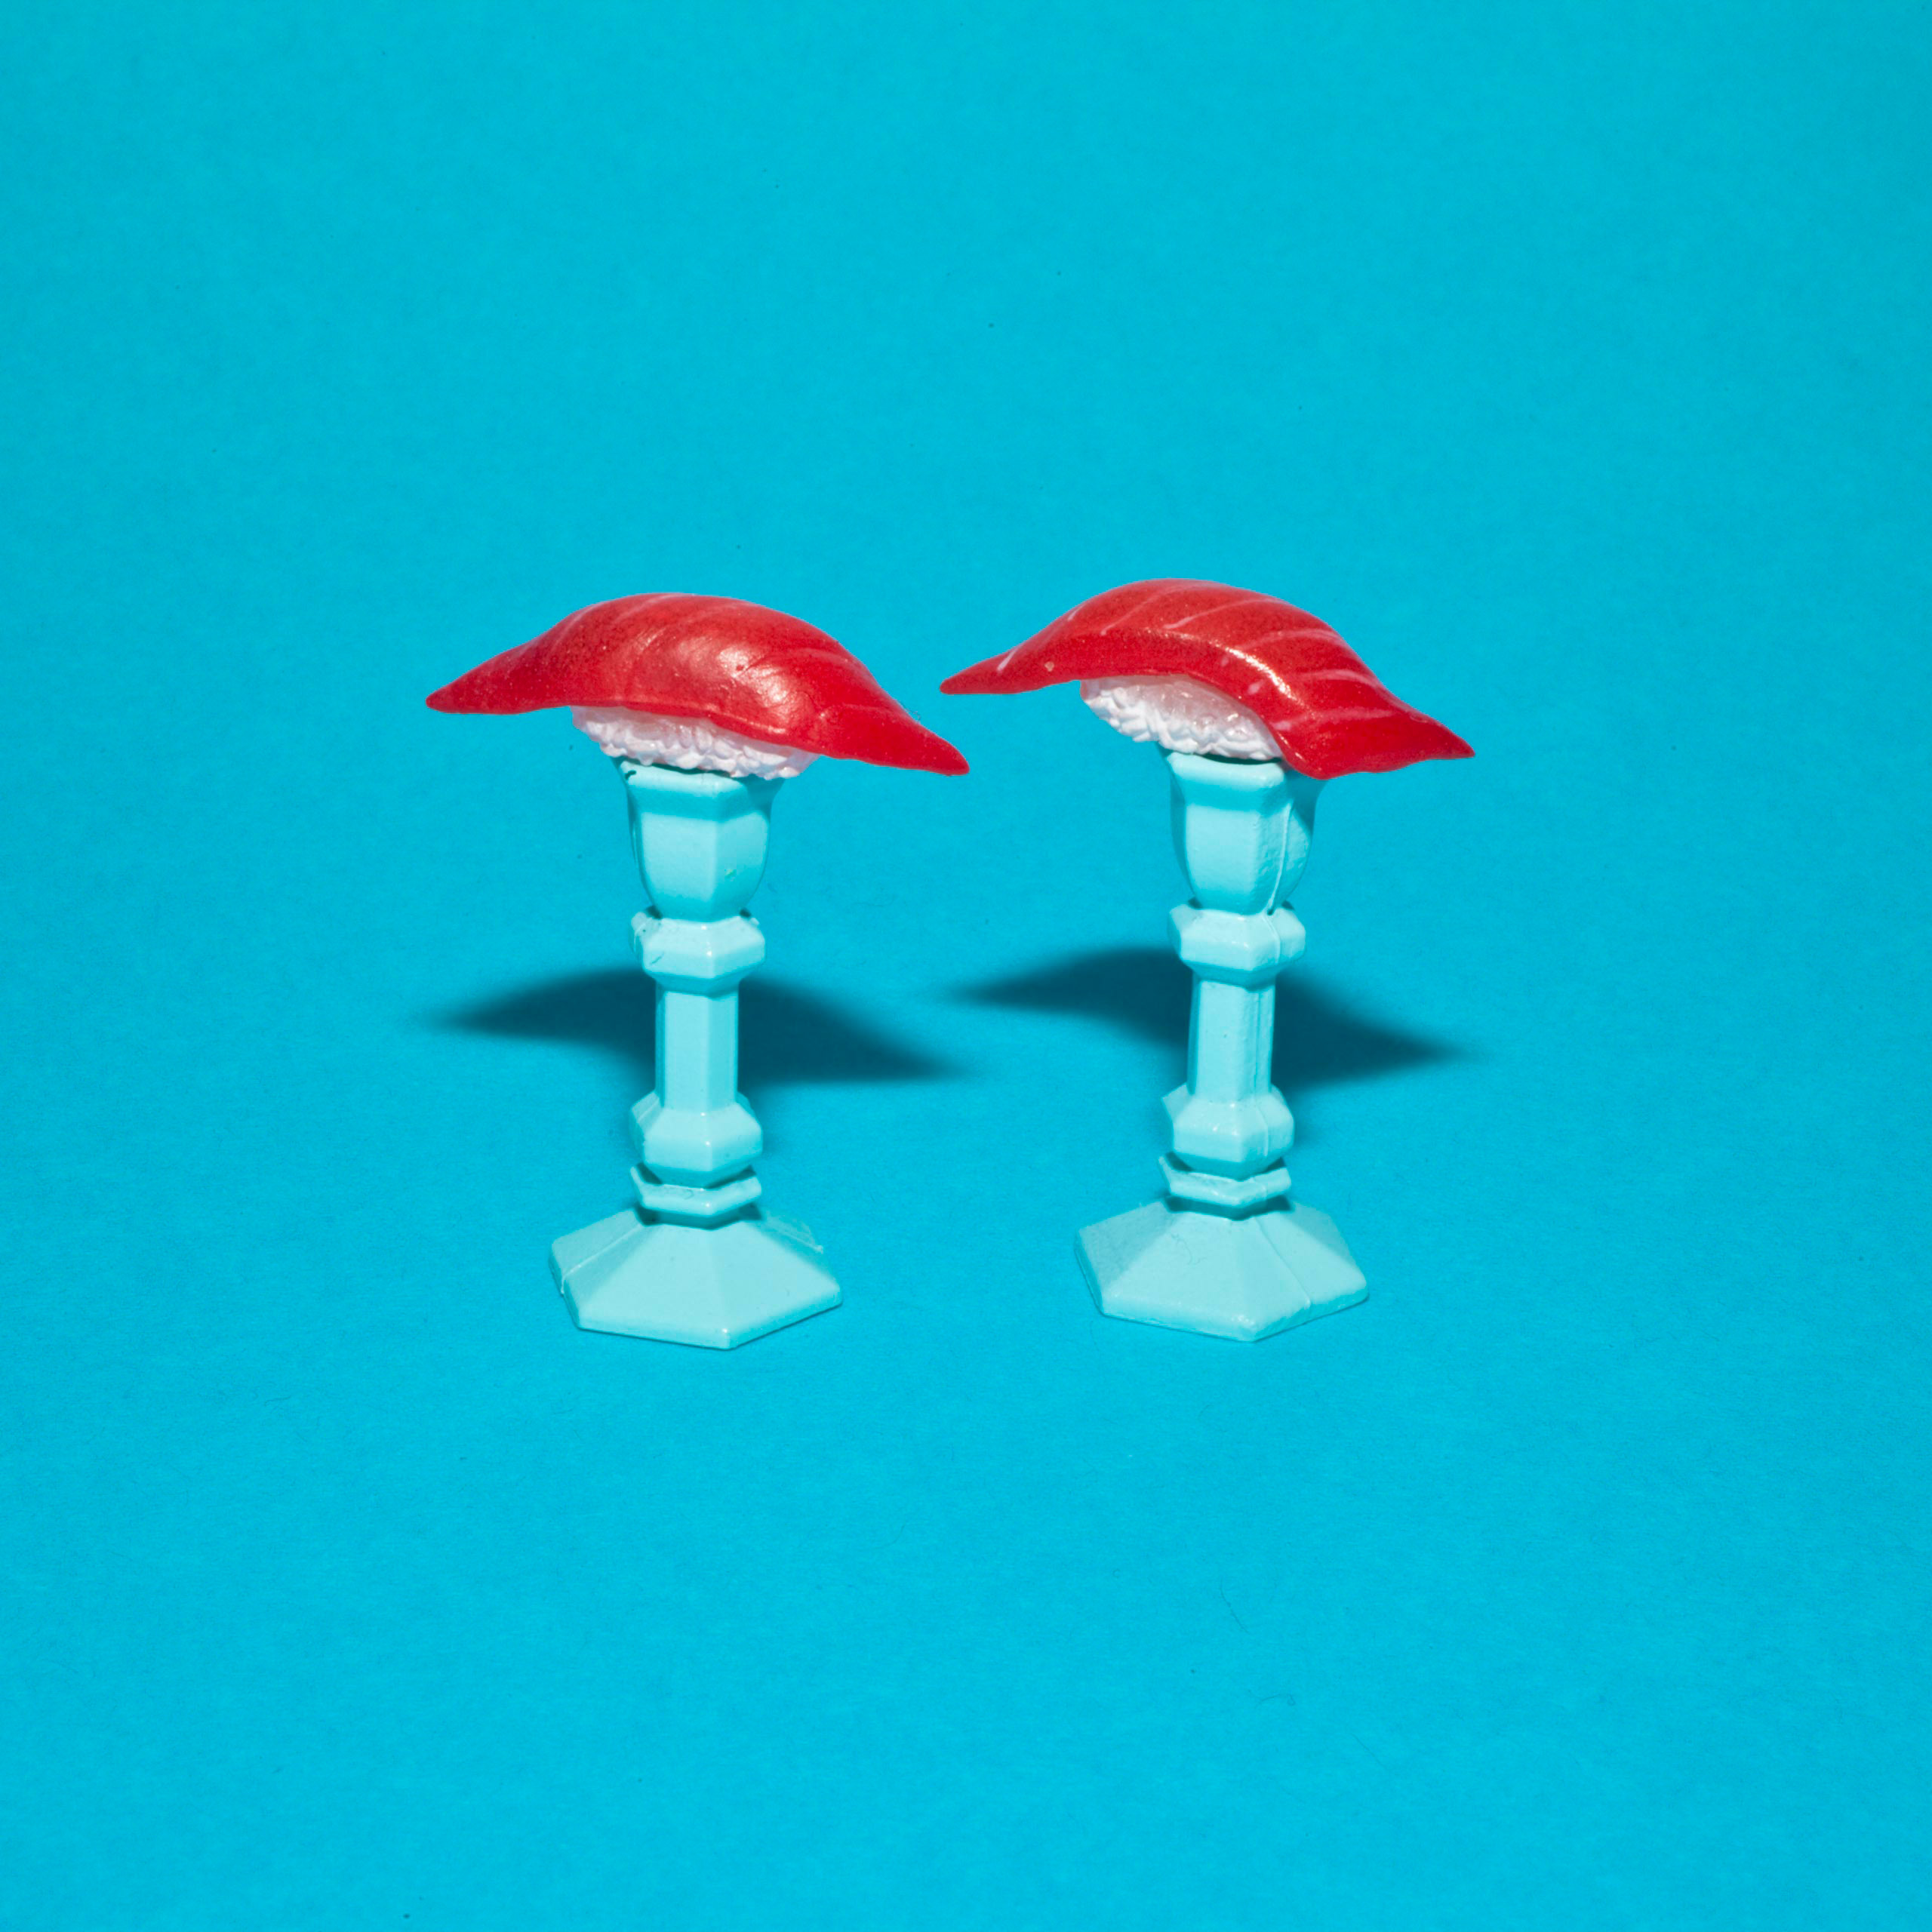 #fishy #twins #sunday #swim #寿司 #초밥 #thingsarequeer